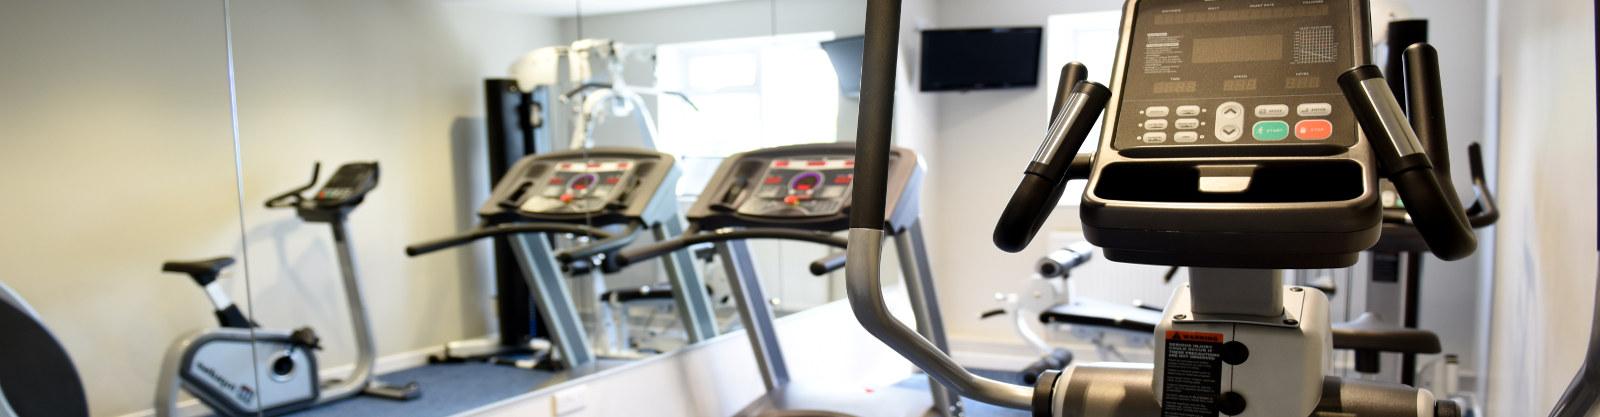 Gym & Fitness Bournemouth